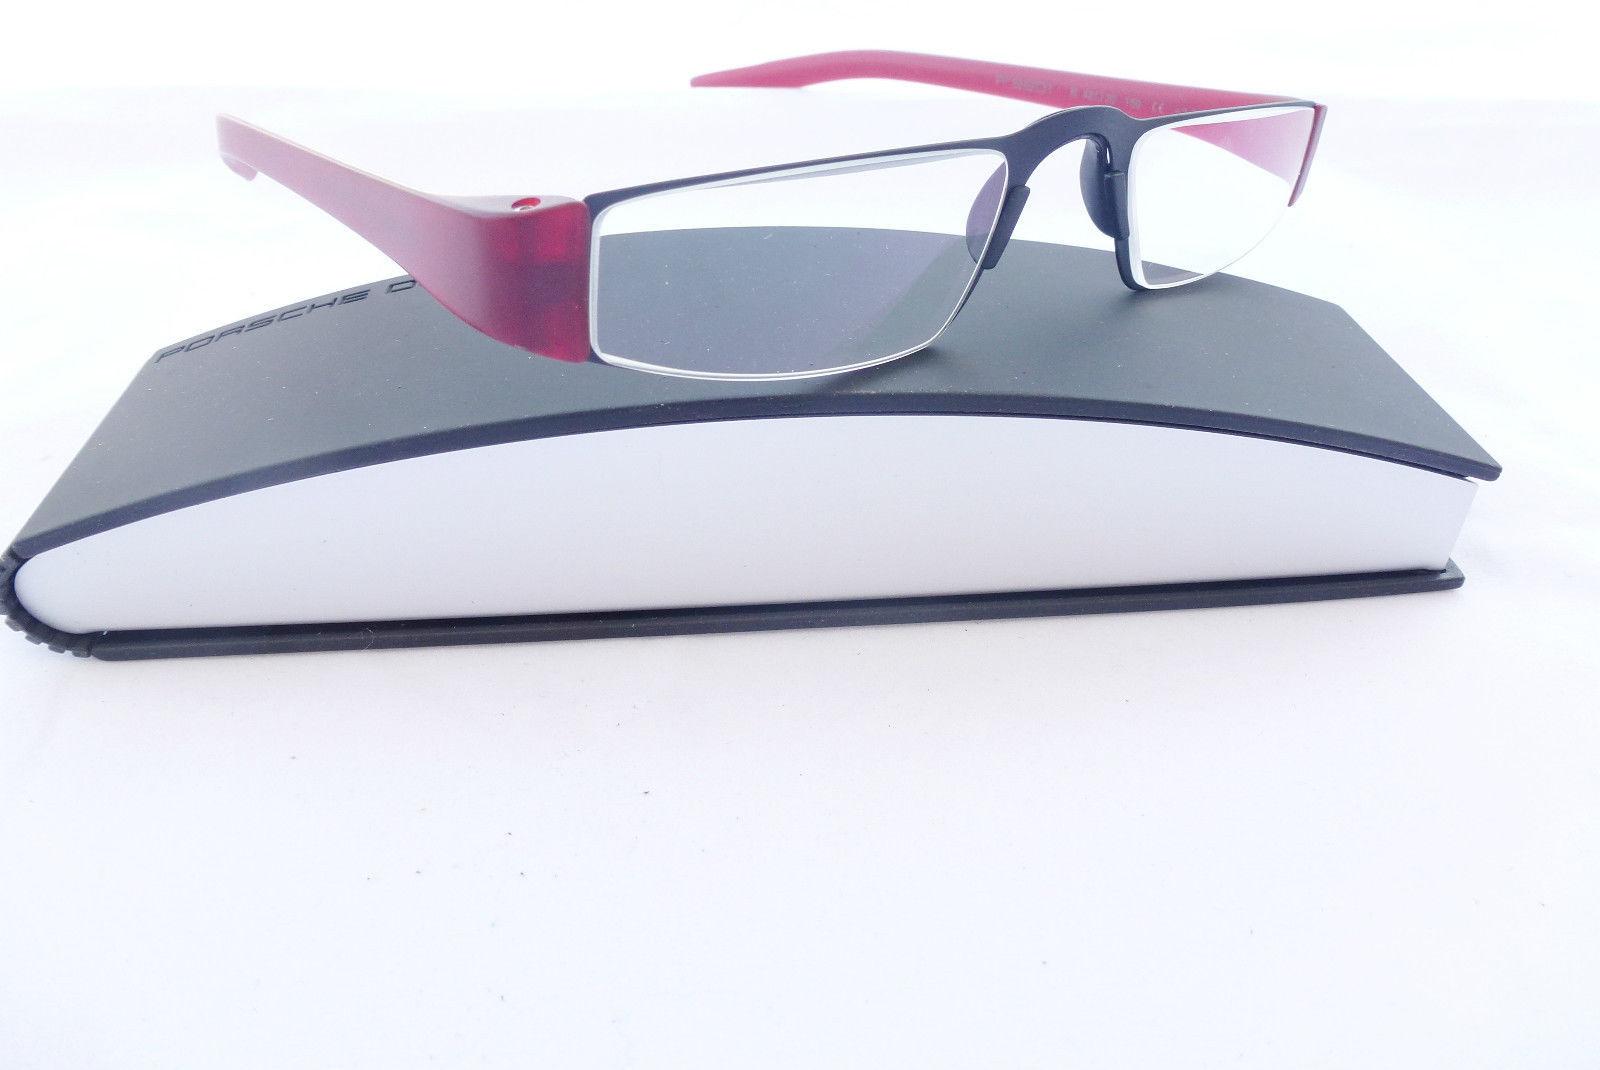 01530c93b4 Porsche Reading Glasses 8801 Porsche Design Men s Eyeglasses P 8801